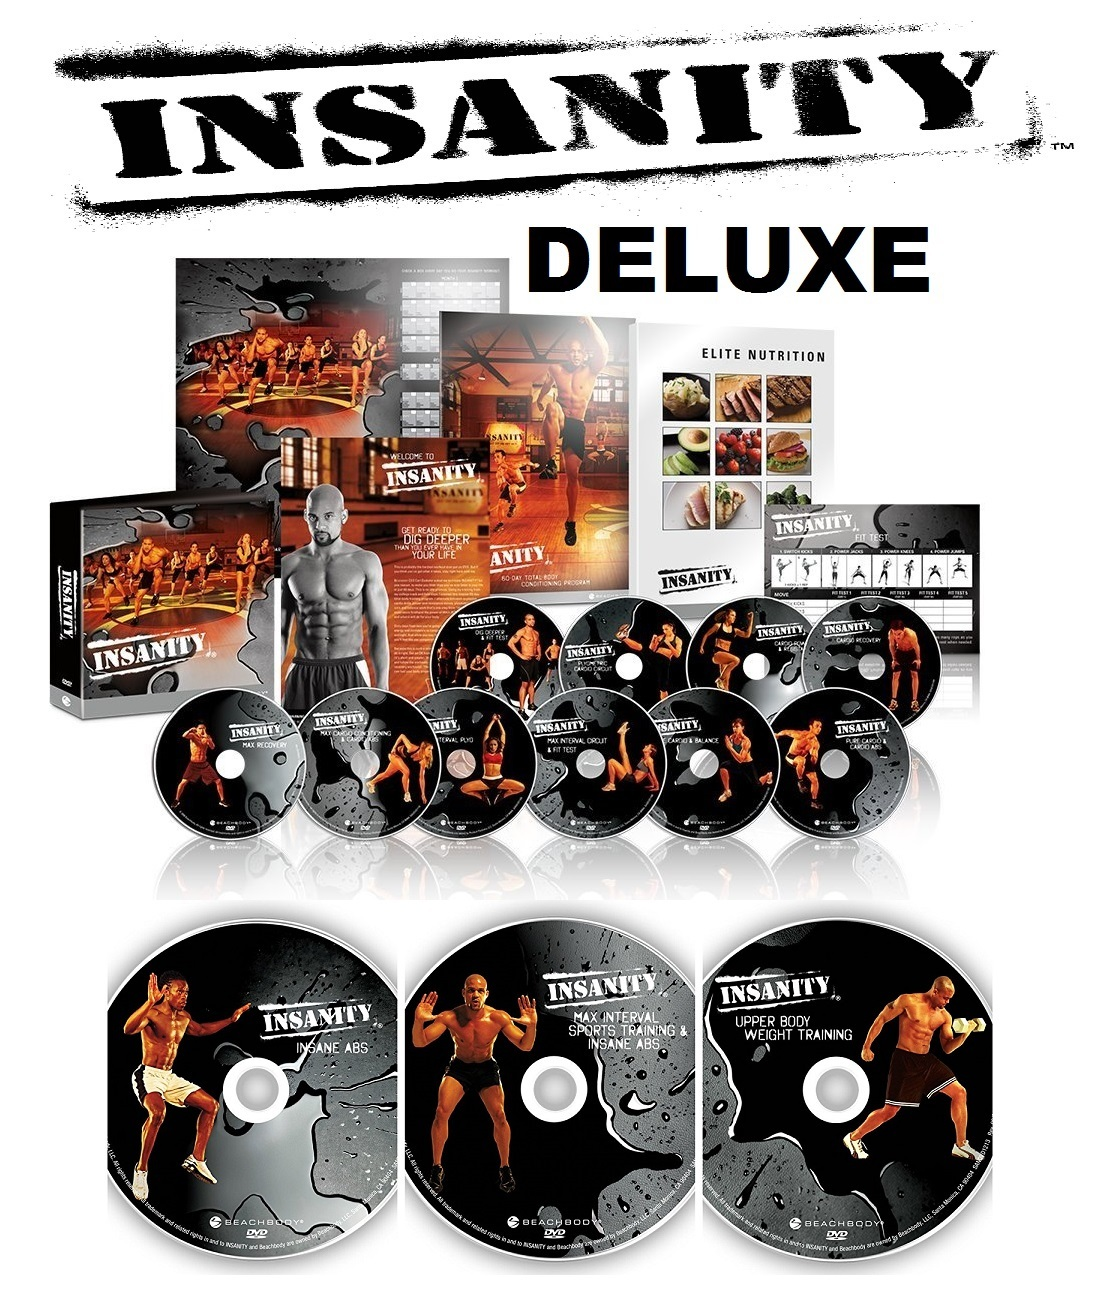 Insanity Workout DVD Program by Shaun T (13 DVD) - Fitness ...